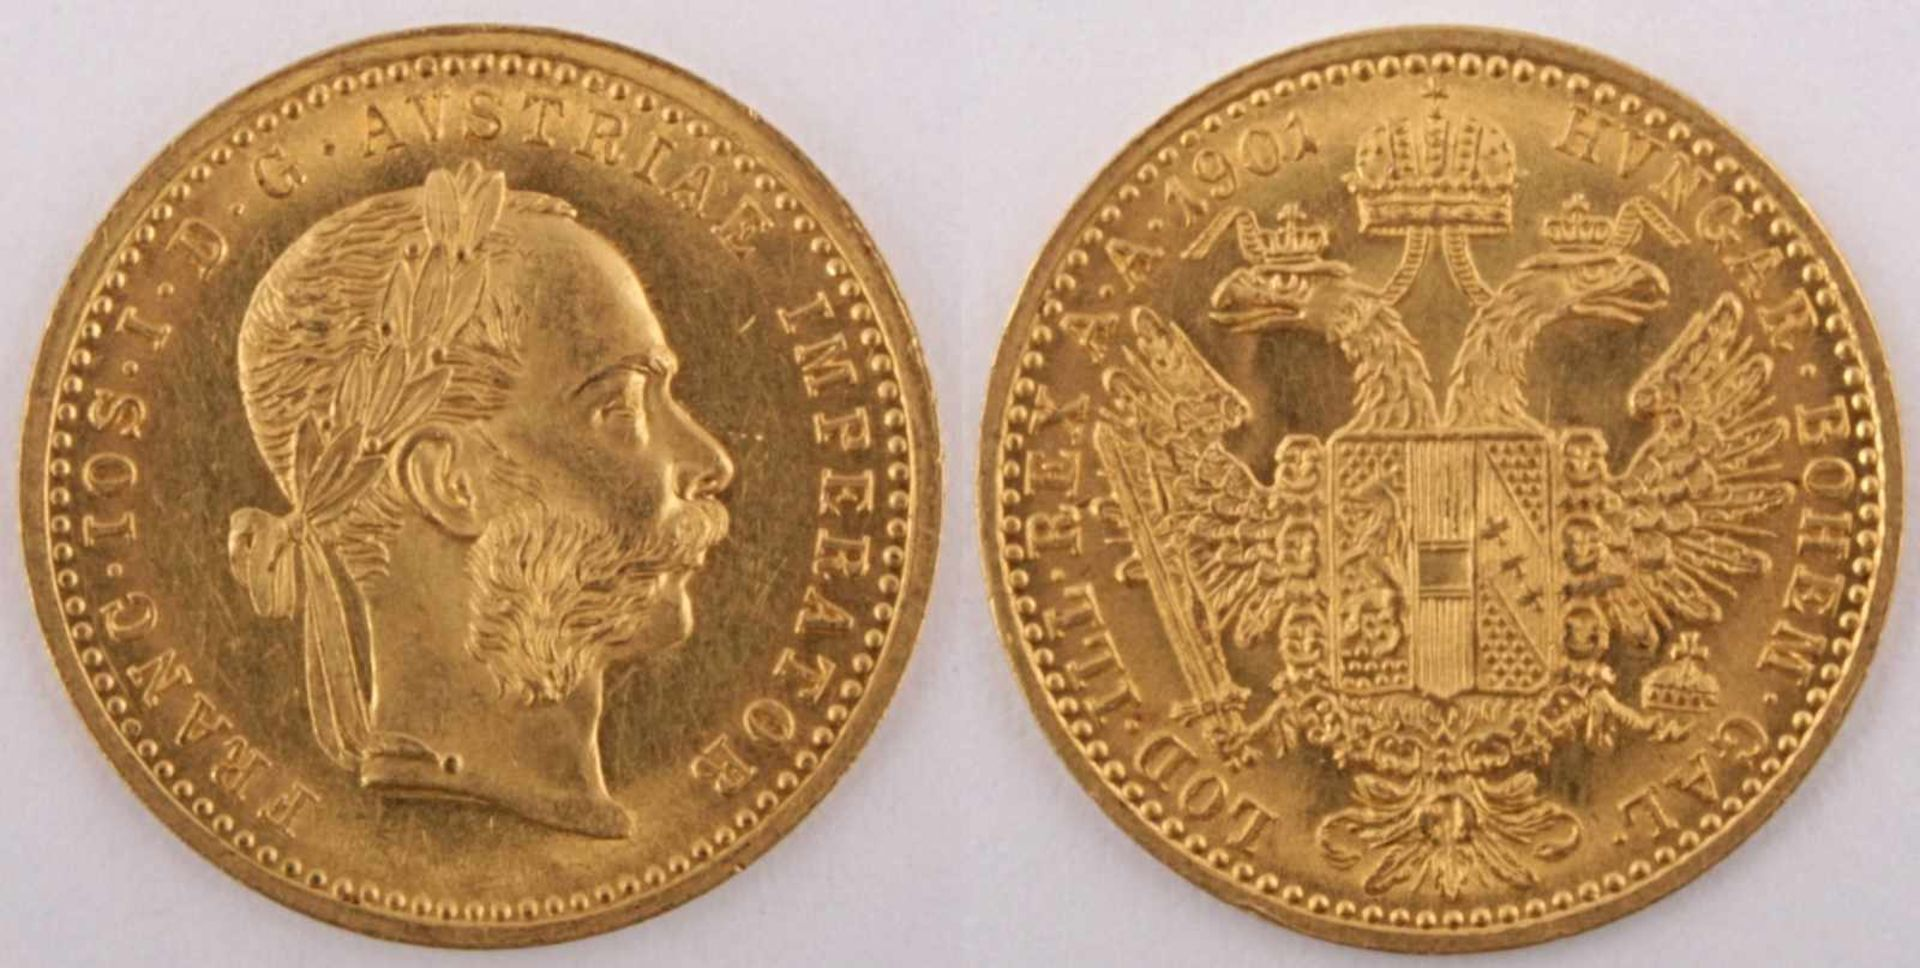 Gold coin: Ducat FJI 1901 Austria-Hungary, Ducat Franz Joseph I., year 1901, gold coin, 986/1000